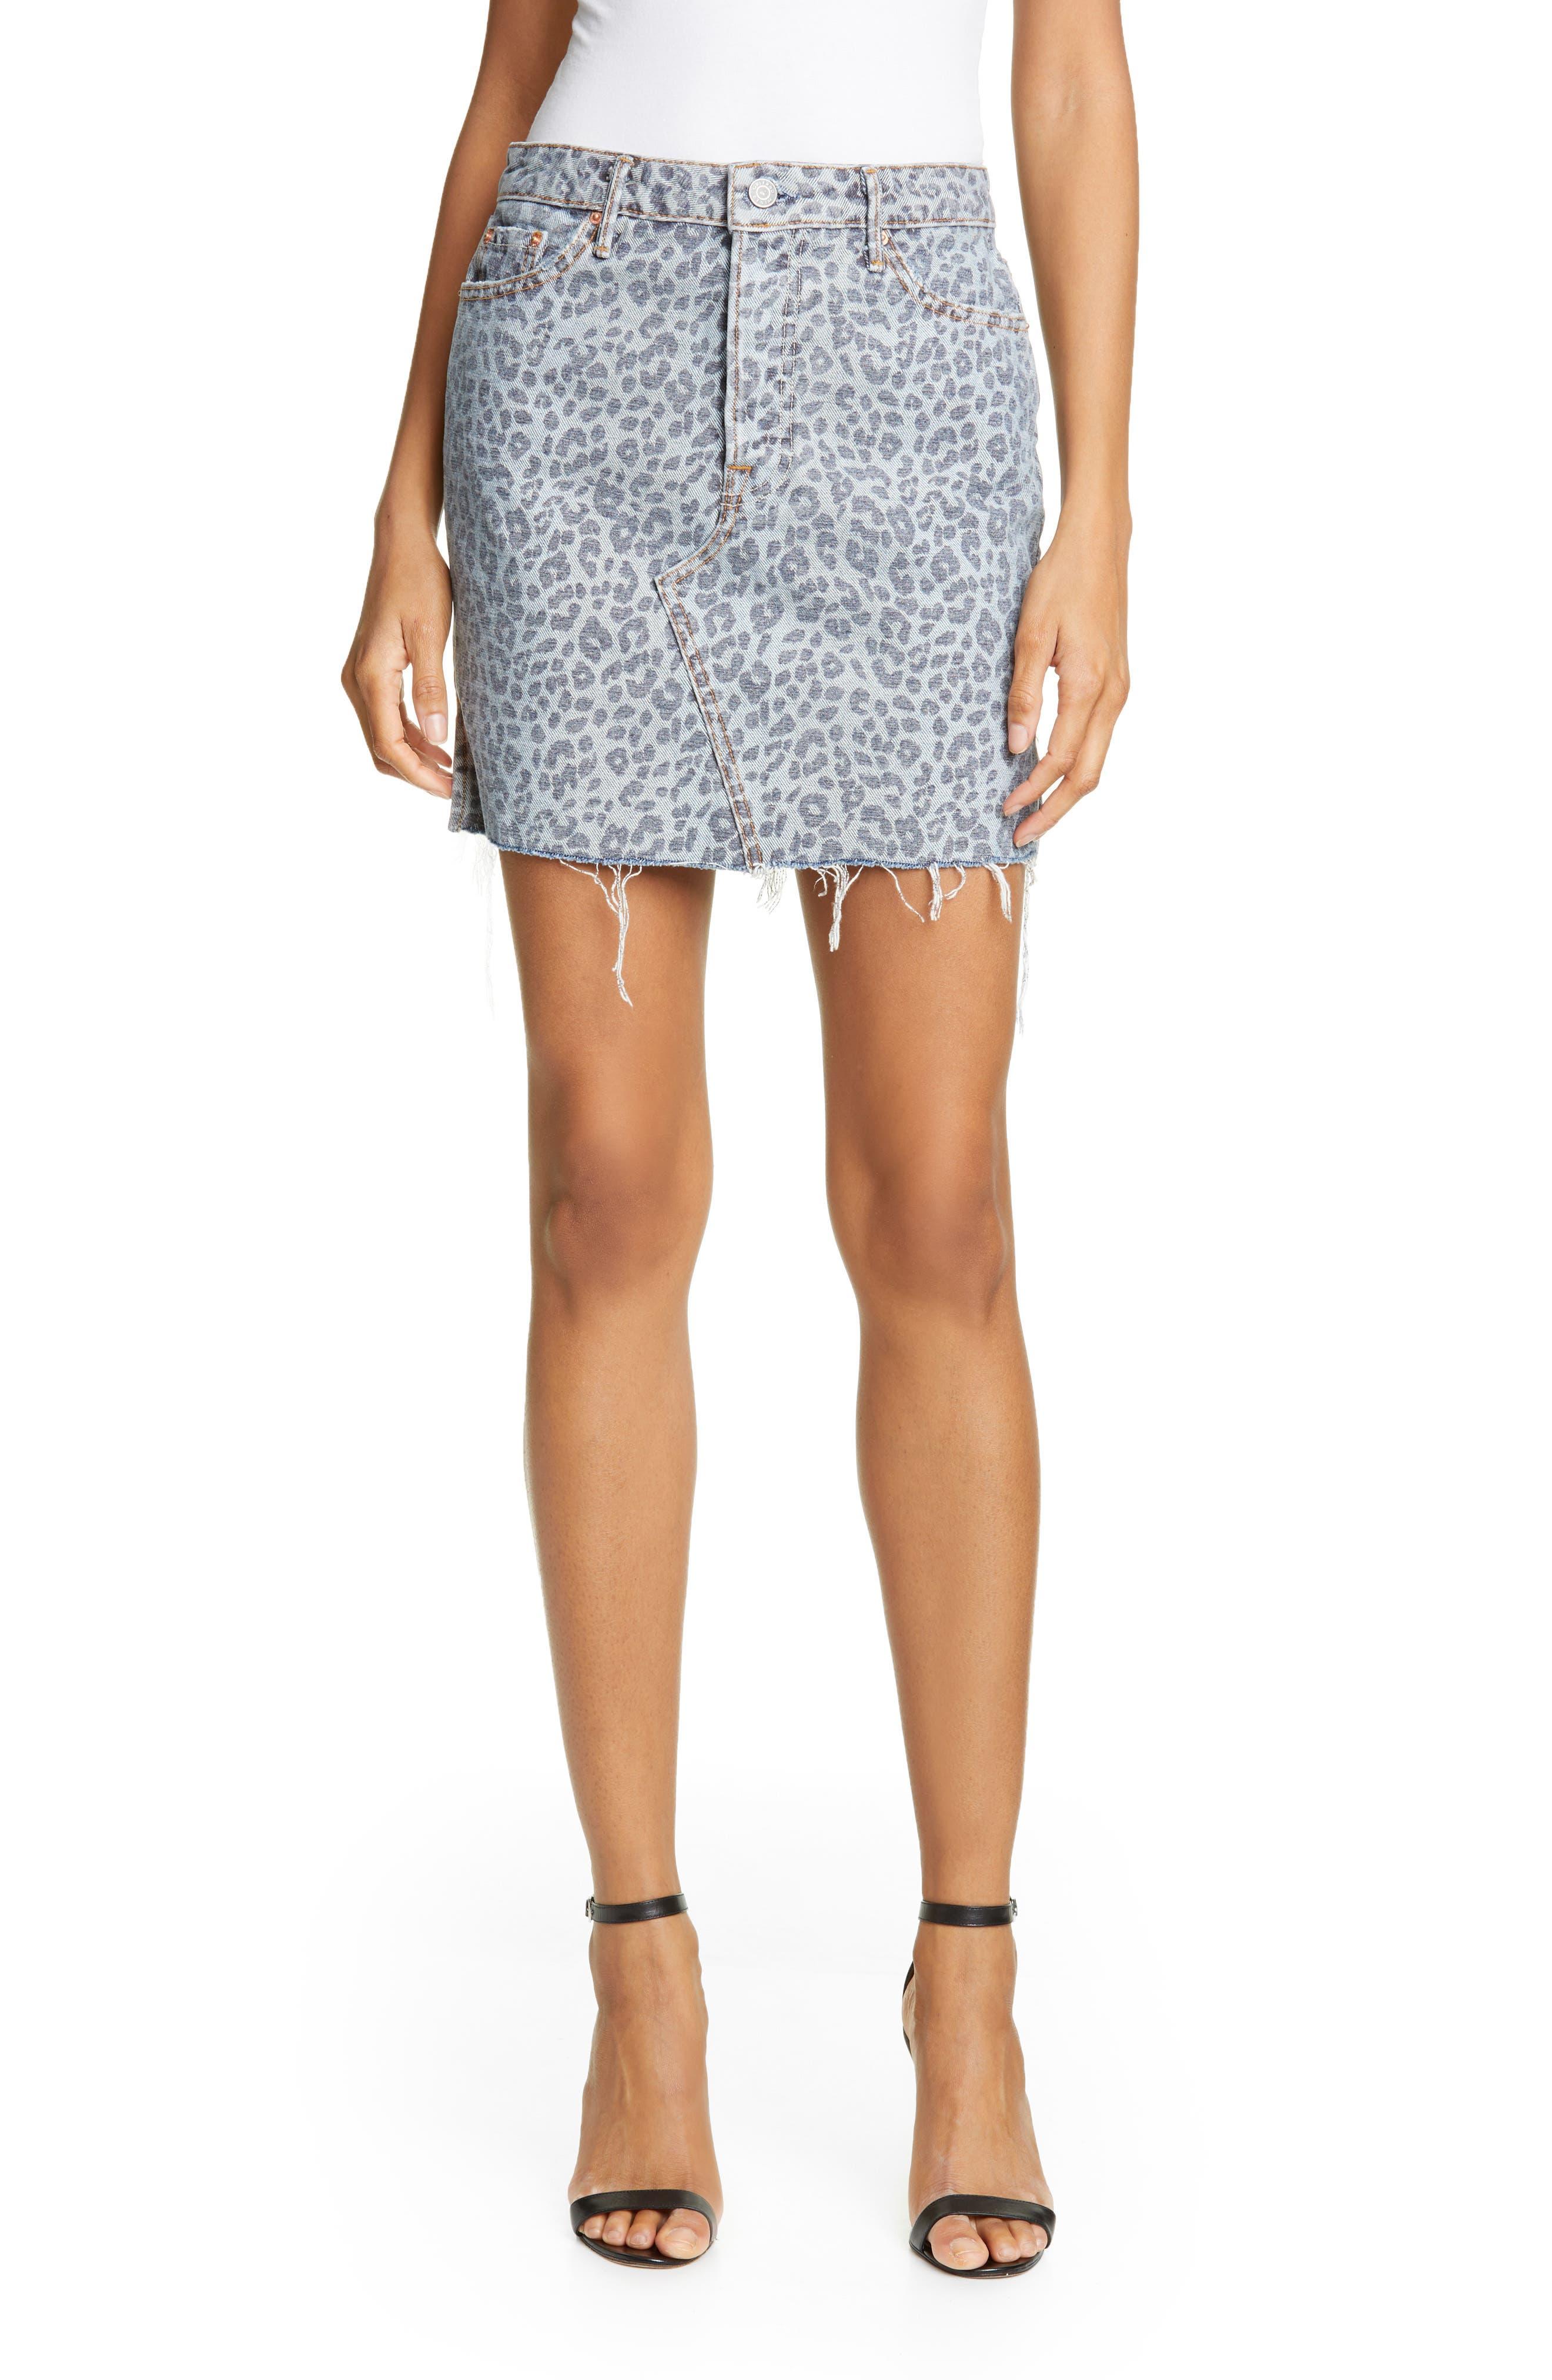 Grlfrnd Skirts Blaire Leopard Print Denim Skirt